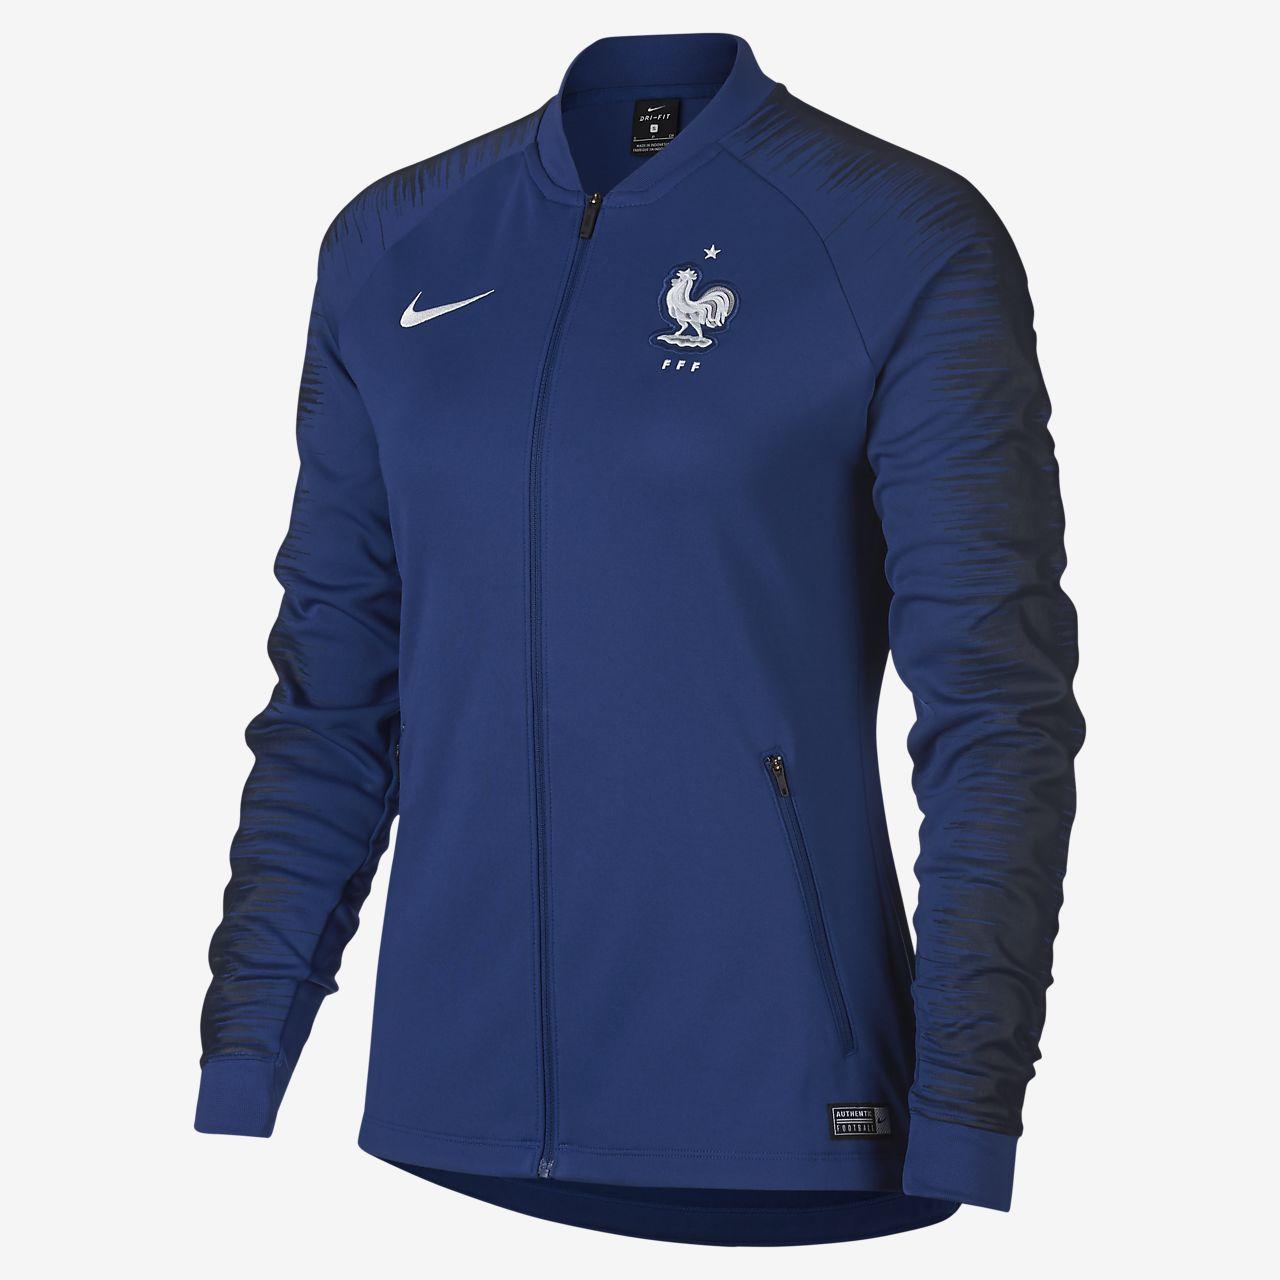 e346e3fbf FFF Anthem Women s Football Jacket. Nike.com IE